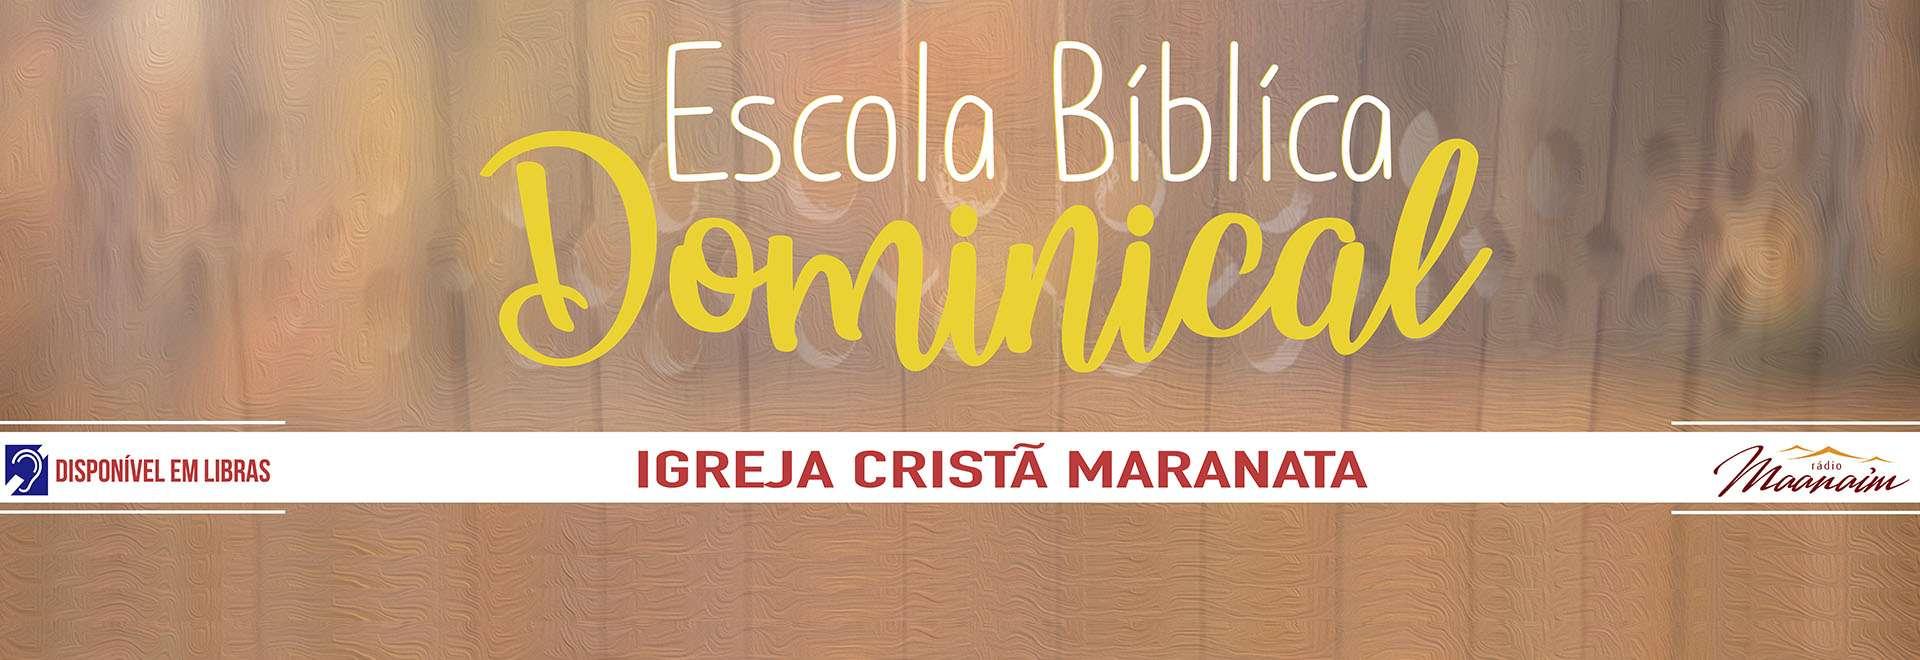 Participações da EBD da Igreja Cristã Maranata - 08/11/2020